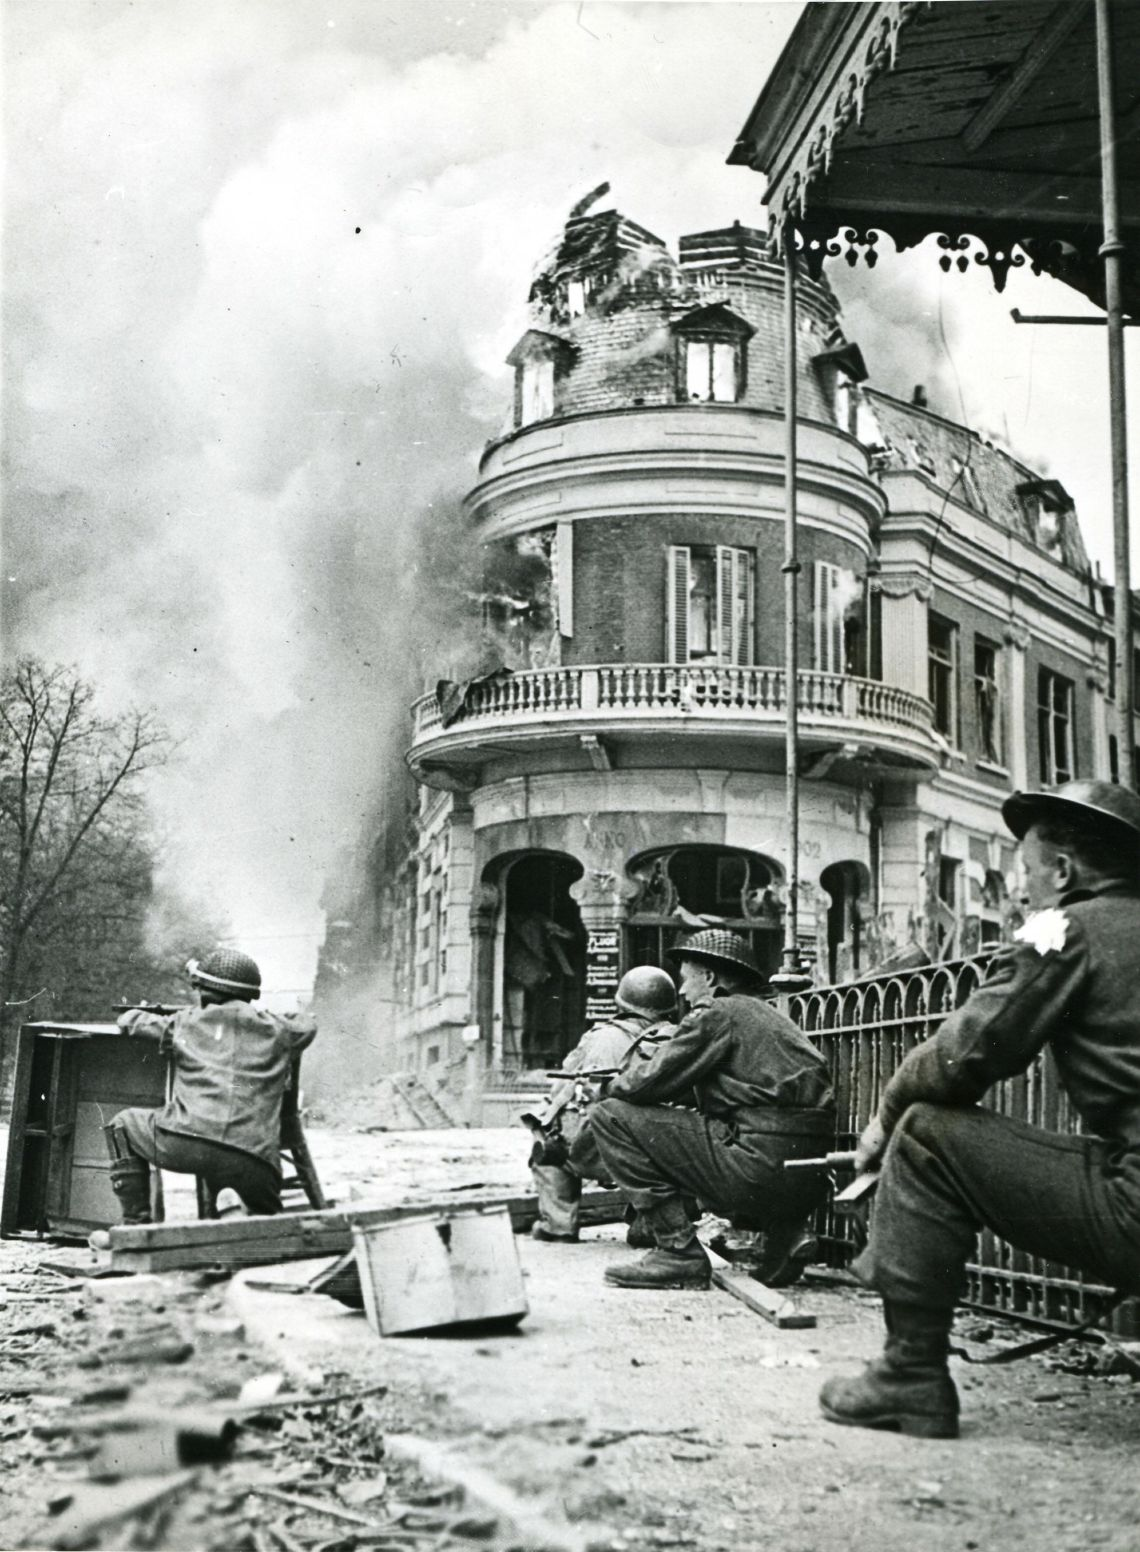 British troops at the Battle of Arnhem